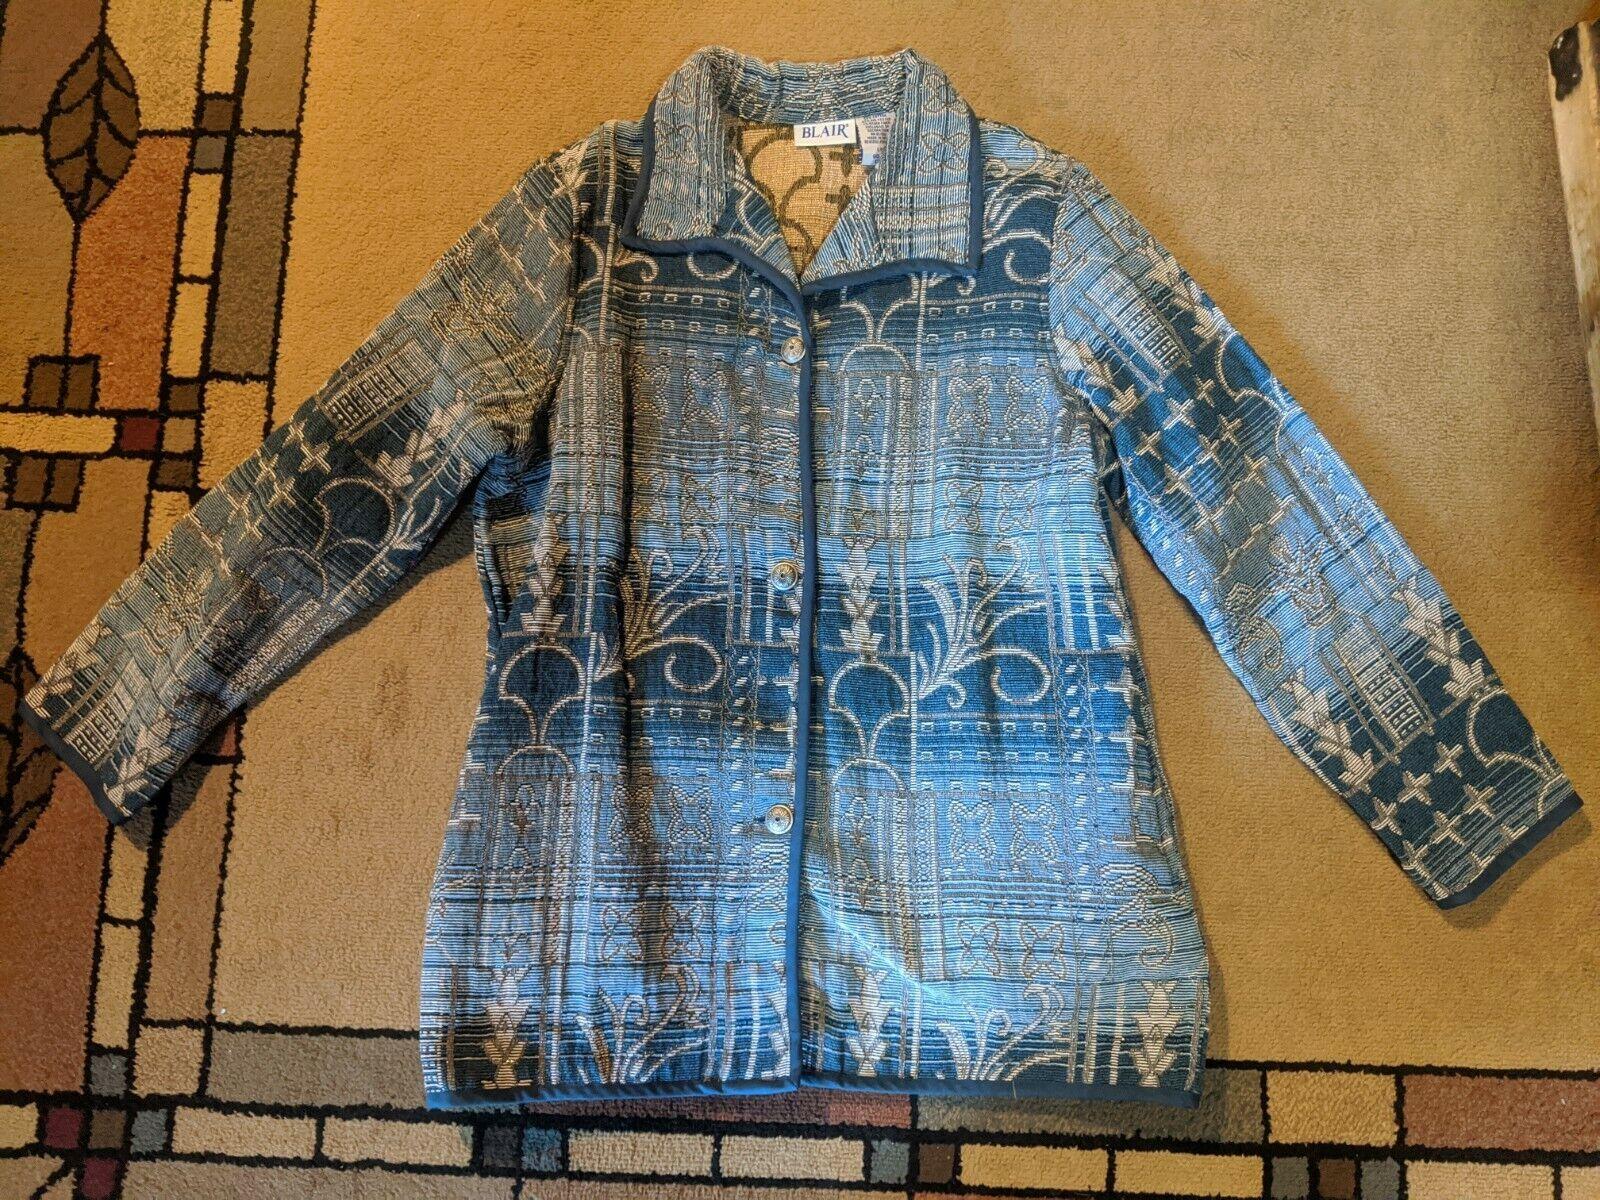 Blair Womens Blue Geometric Blazer Coat Jacket Buttons Collared Large L EUC!